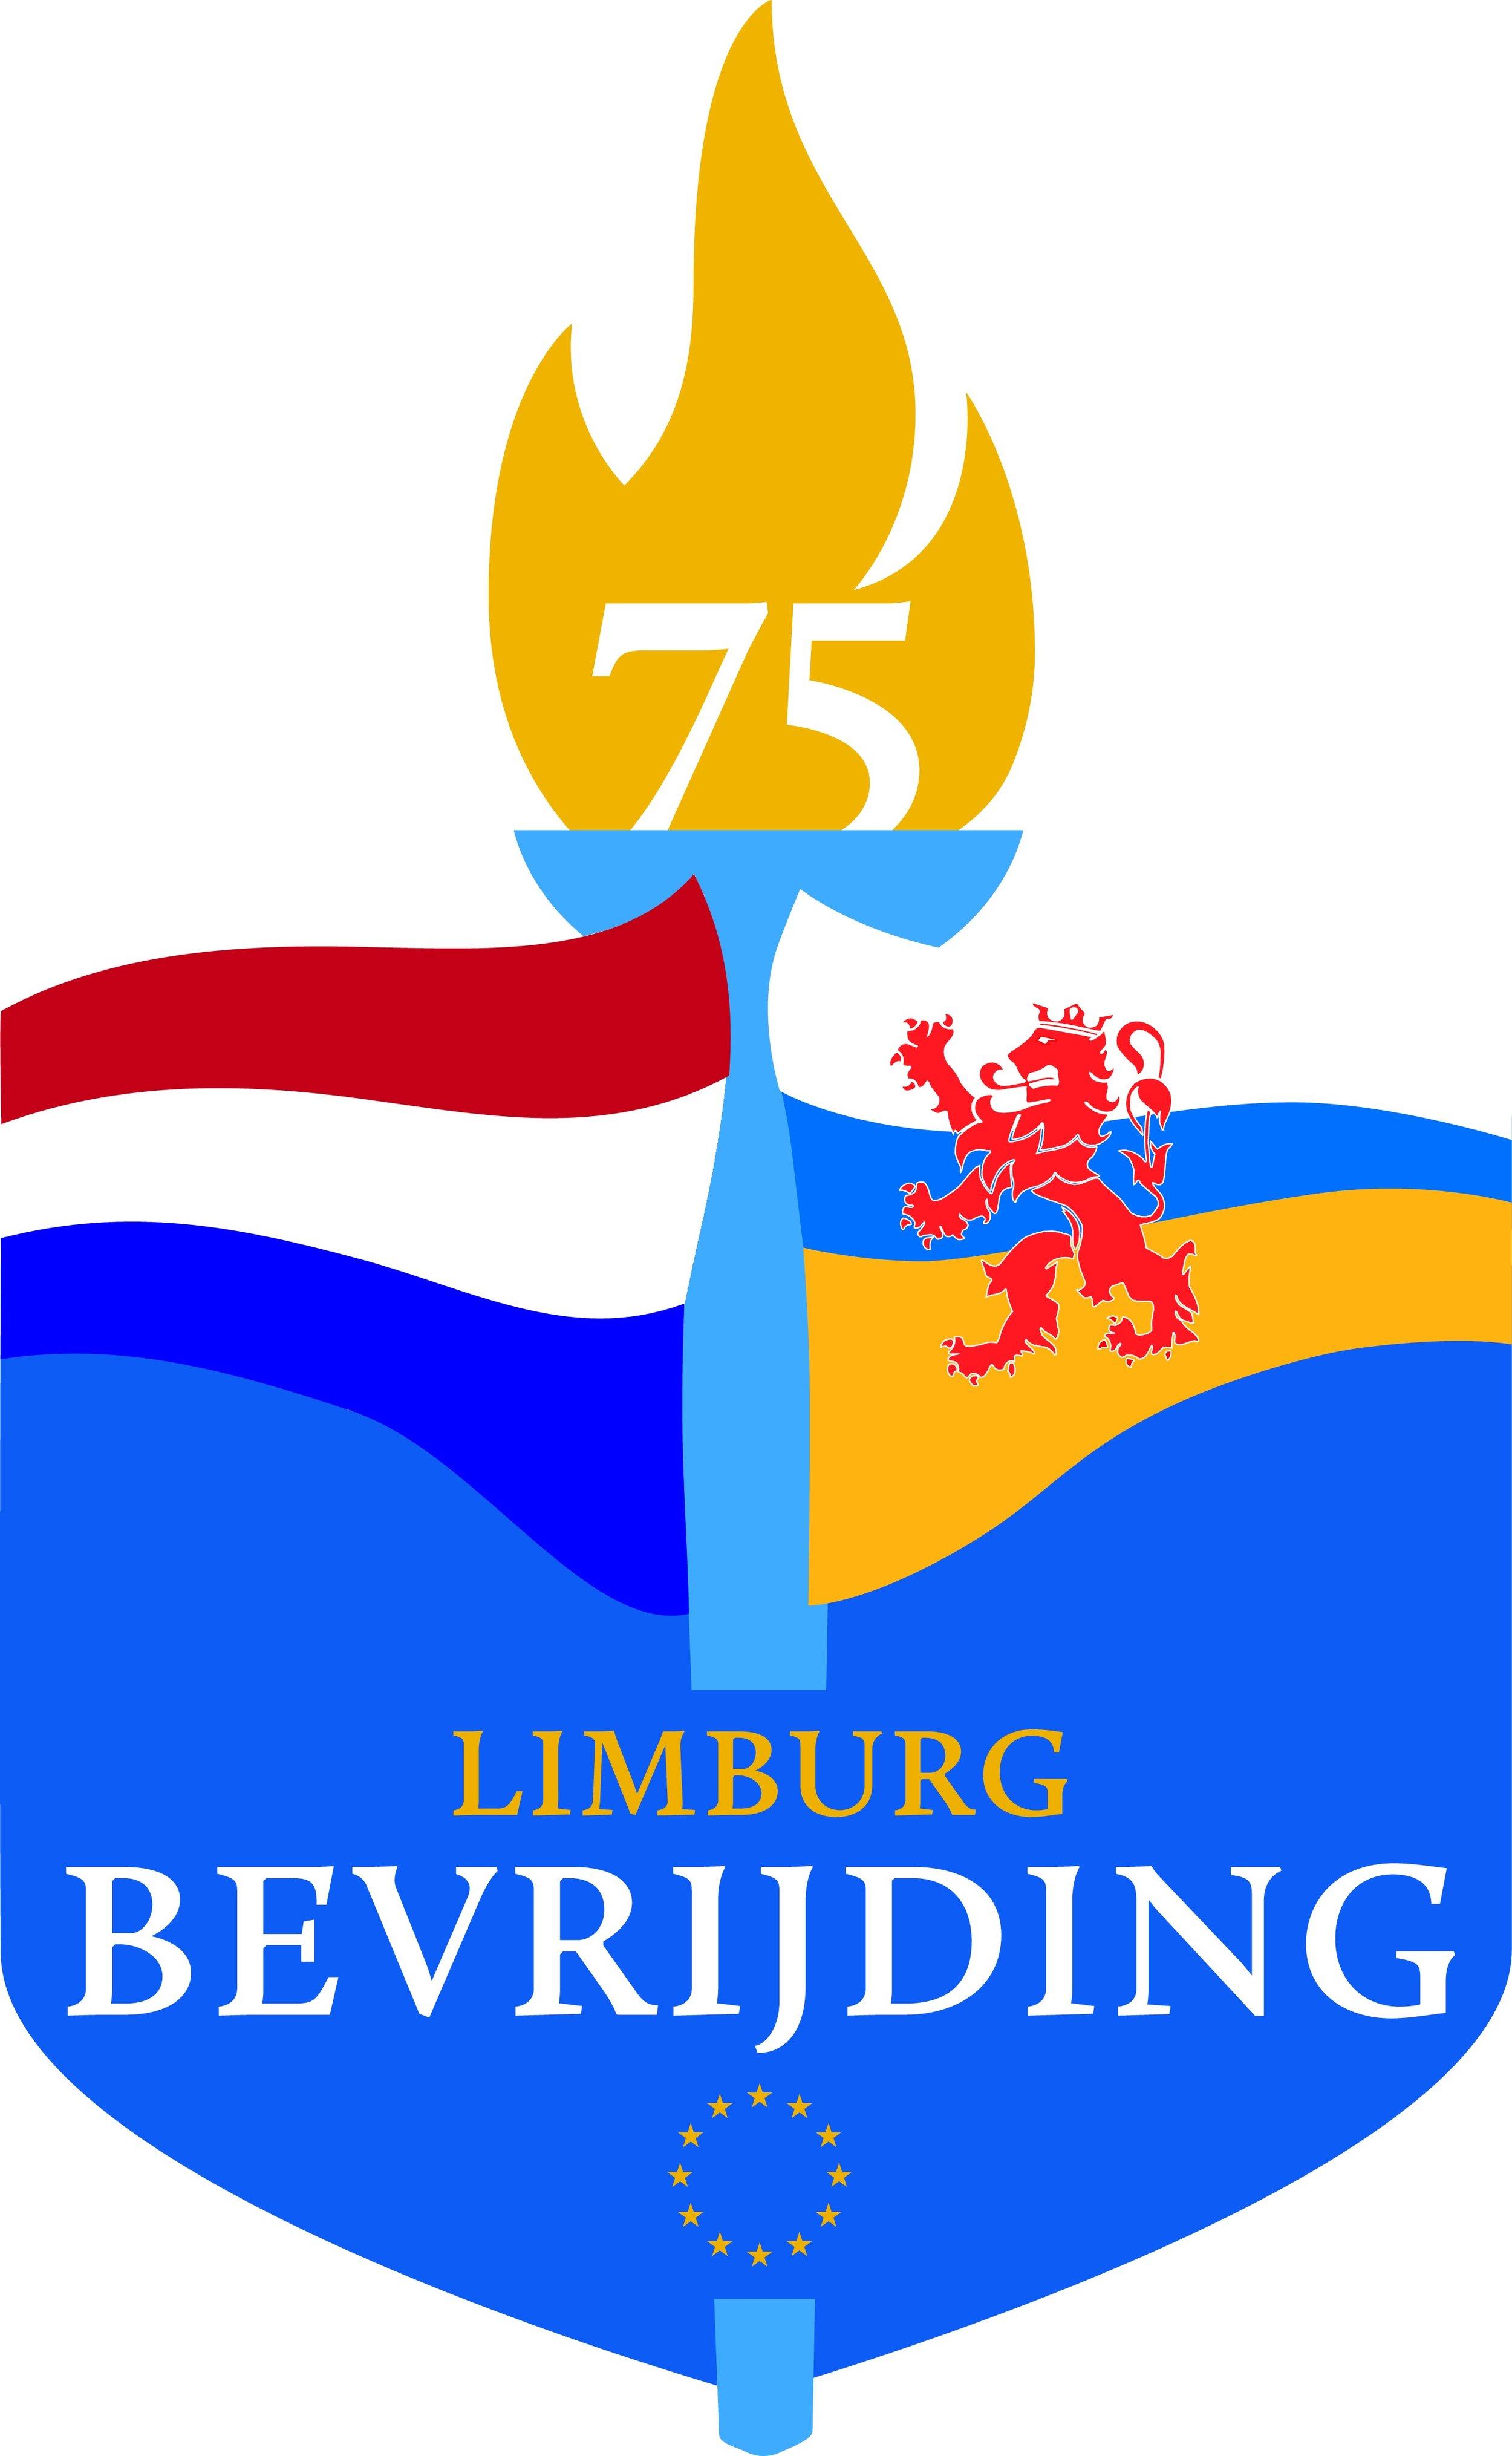 Limburg_75_jaar_bevrijding_logo_EPS_formaat.eps.jpg